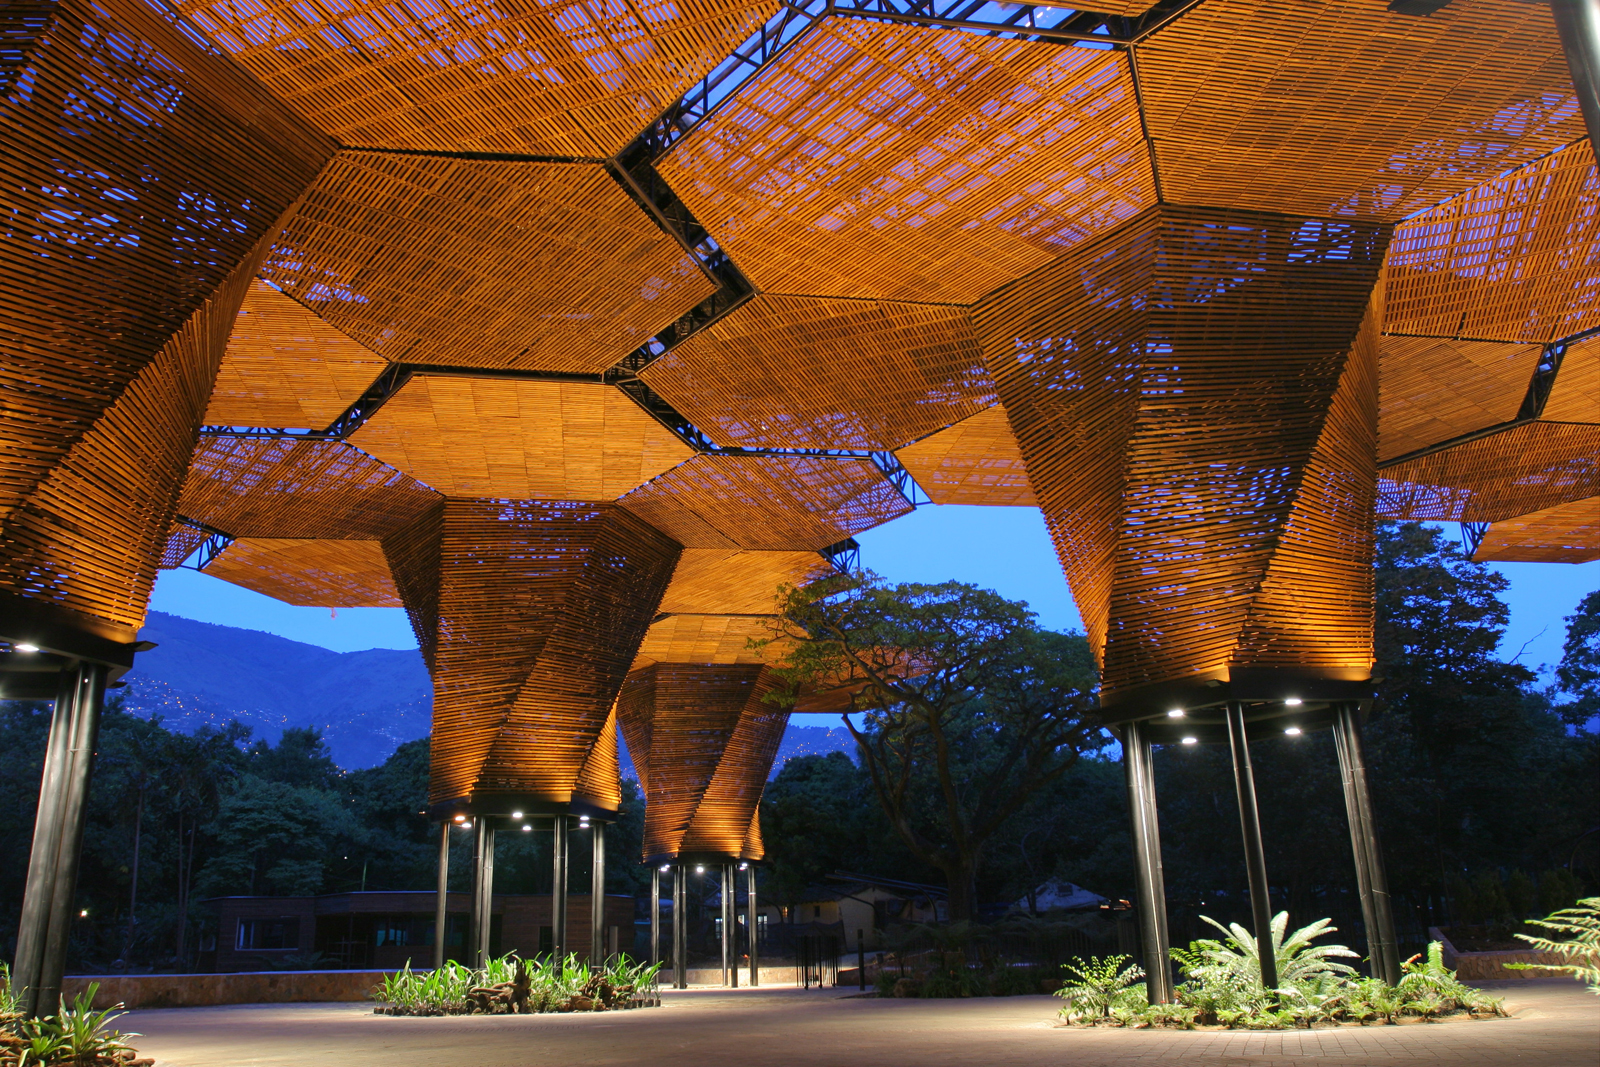 Medellín, Colombia, Jardin Botanico-Orquideorama (Botanical Garden). Alejandro Bernal (Colombian, b. 1973), Felipe Mesa (Colombian, b. 1975), Camilo Restrepo (Colombian, b. 1974), and J. Paul Restrepo (Colombian, b. 1944), PLAN B Architects. Colombia, 200